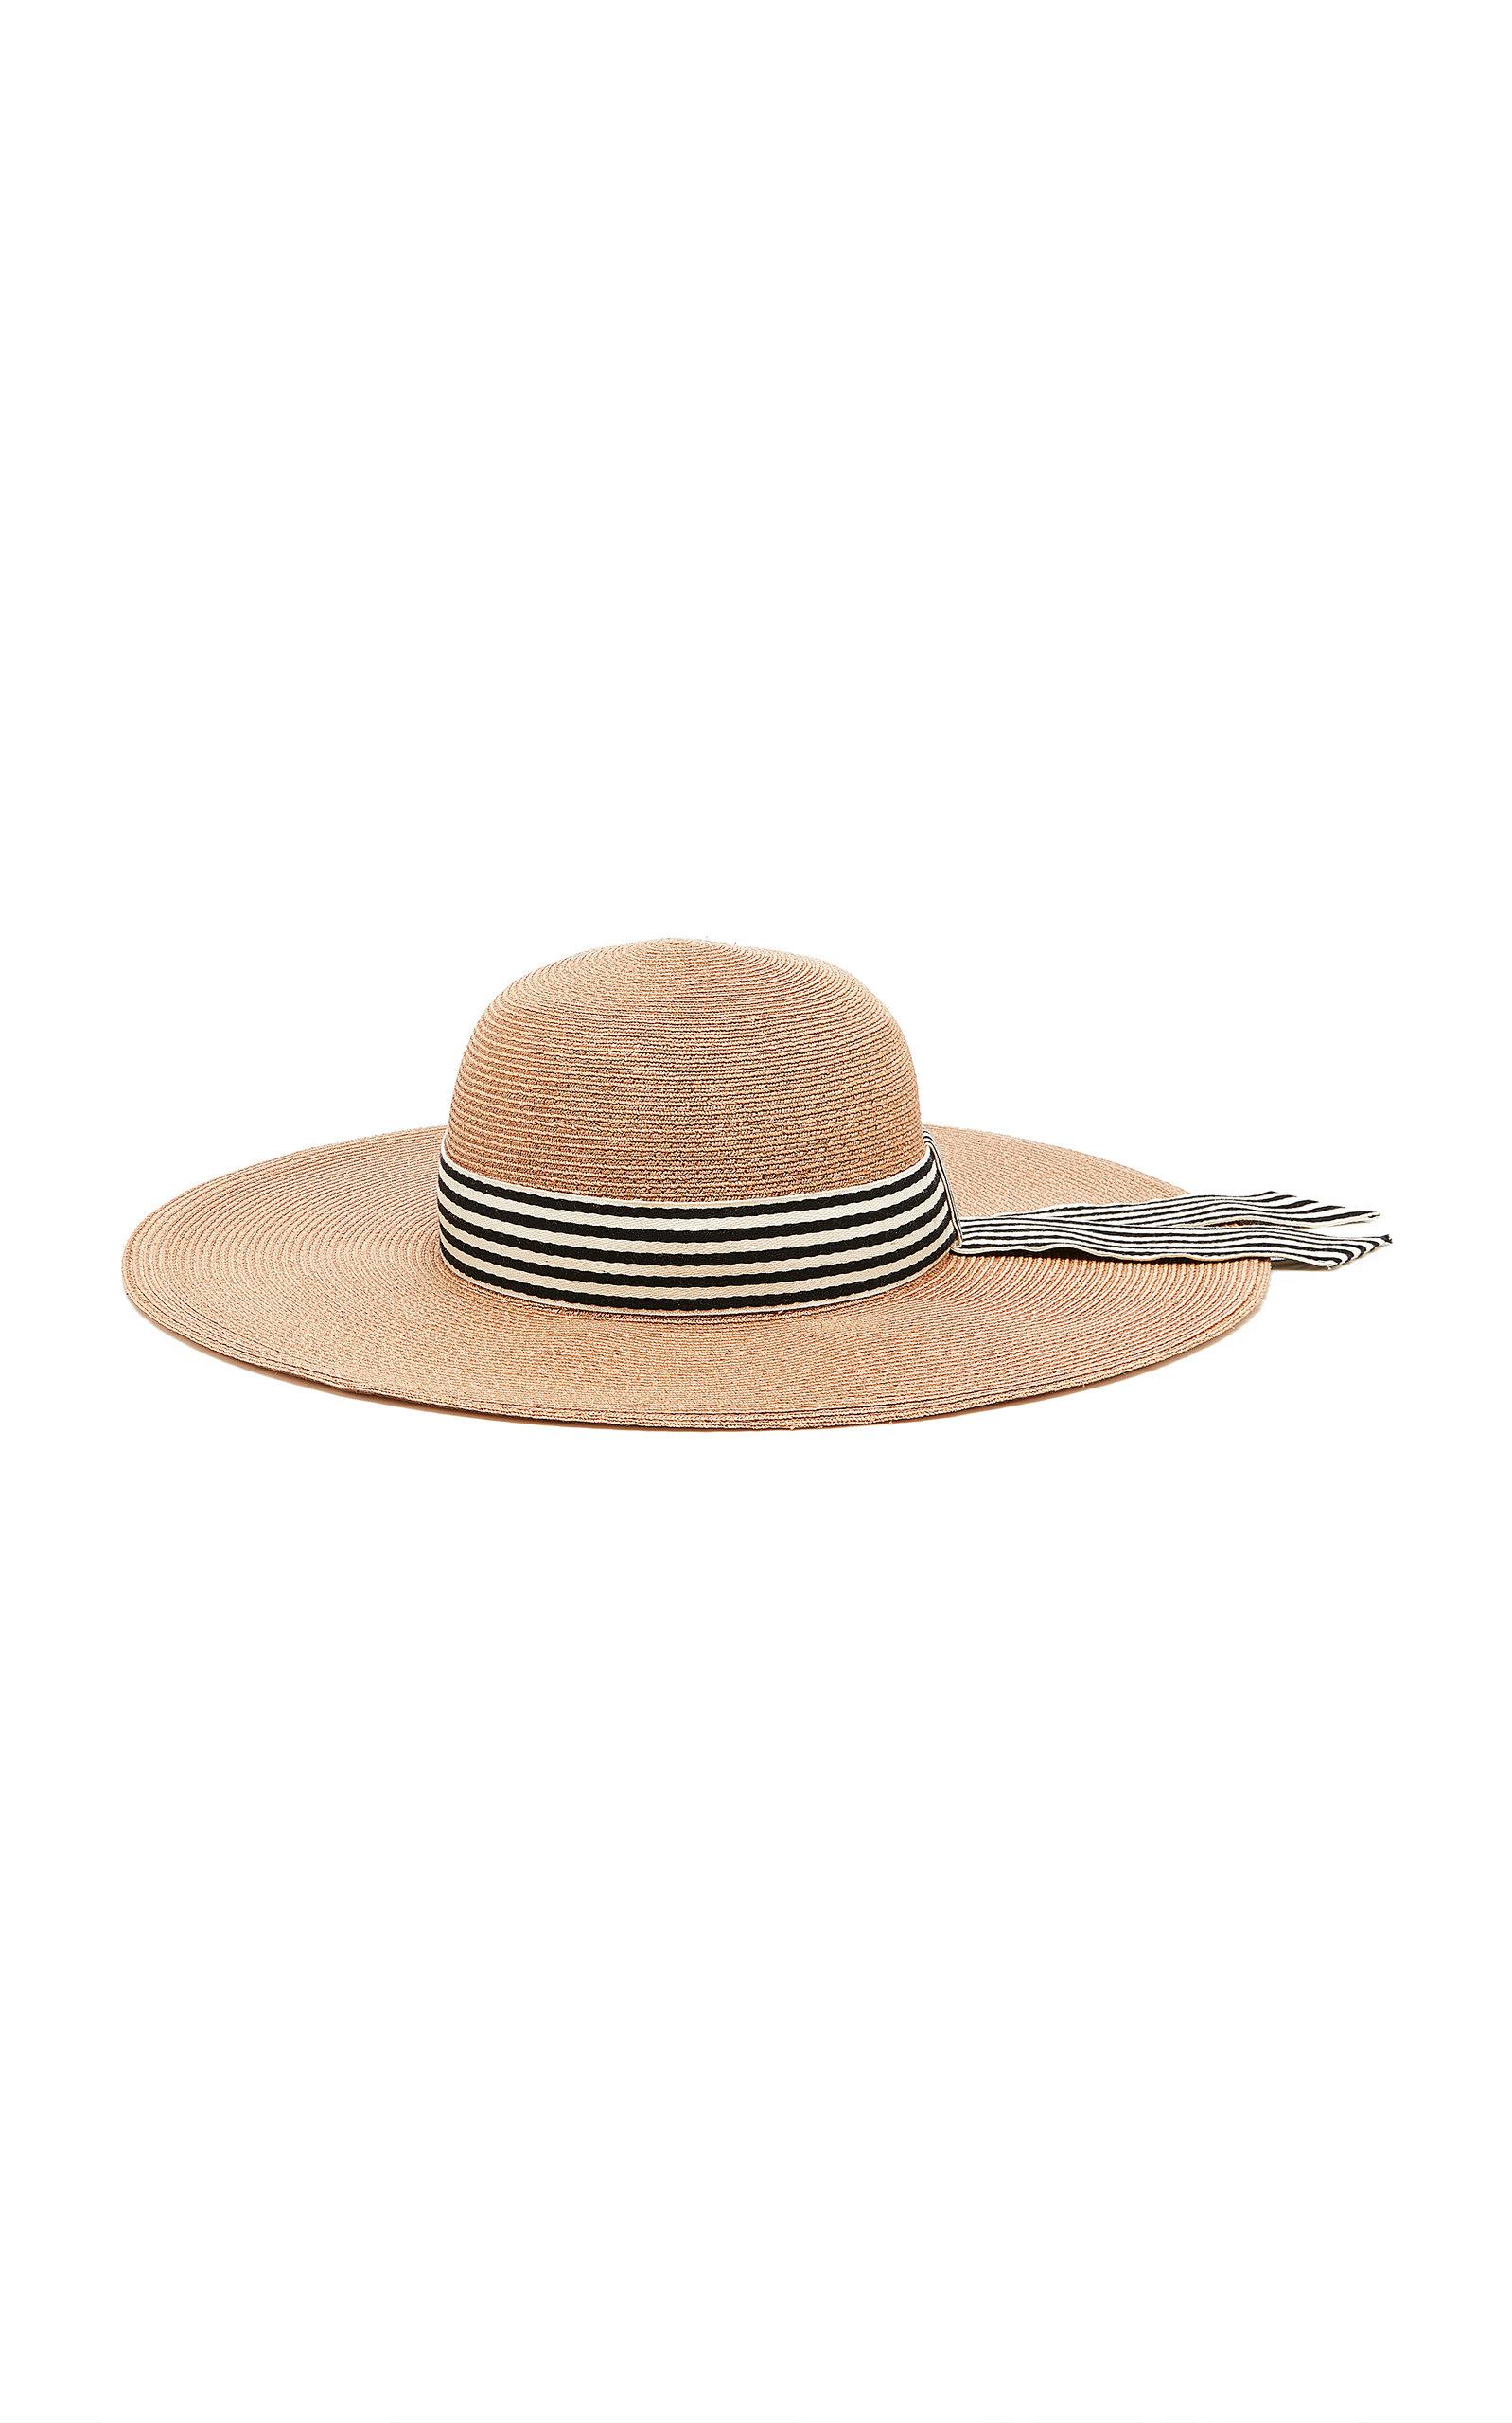 57f417b0ffb32 Eugenia KimHoney Hat. CLOSE. Loading. Loading. Loading. Eugenia  KimExclusive Mirabel Straw Sunhat